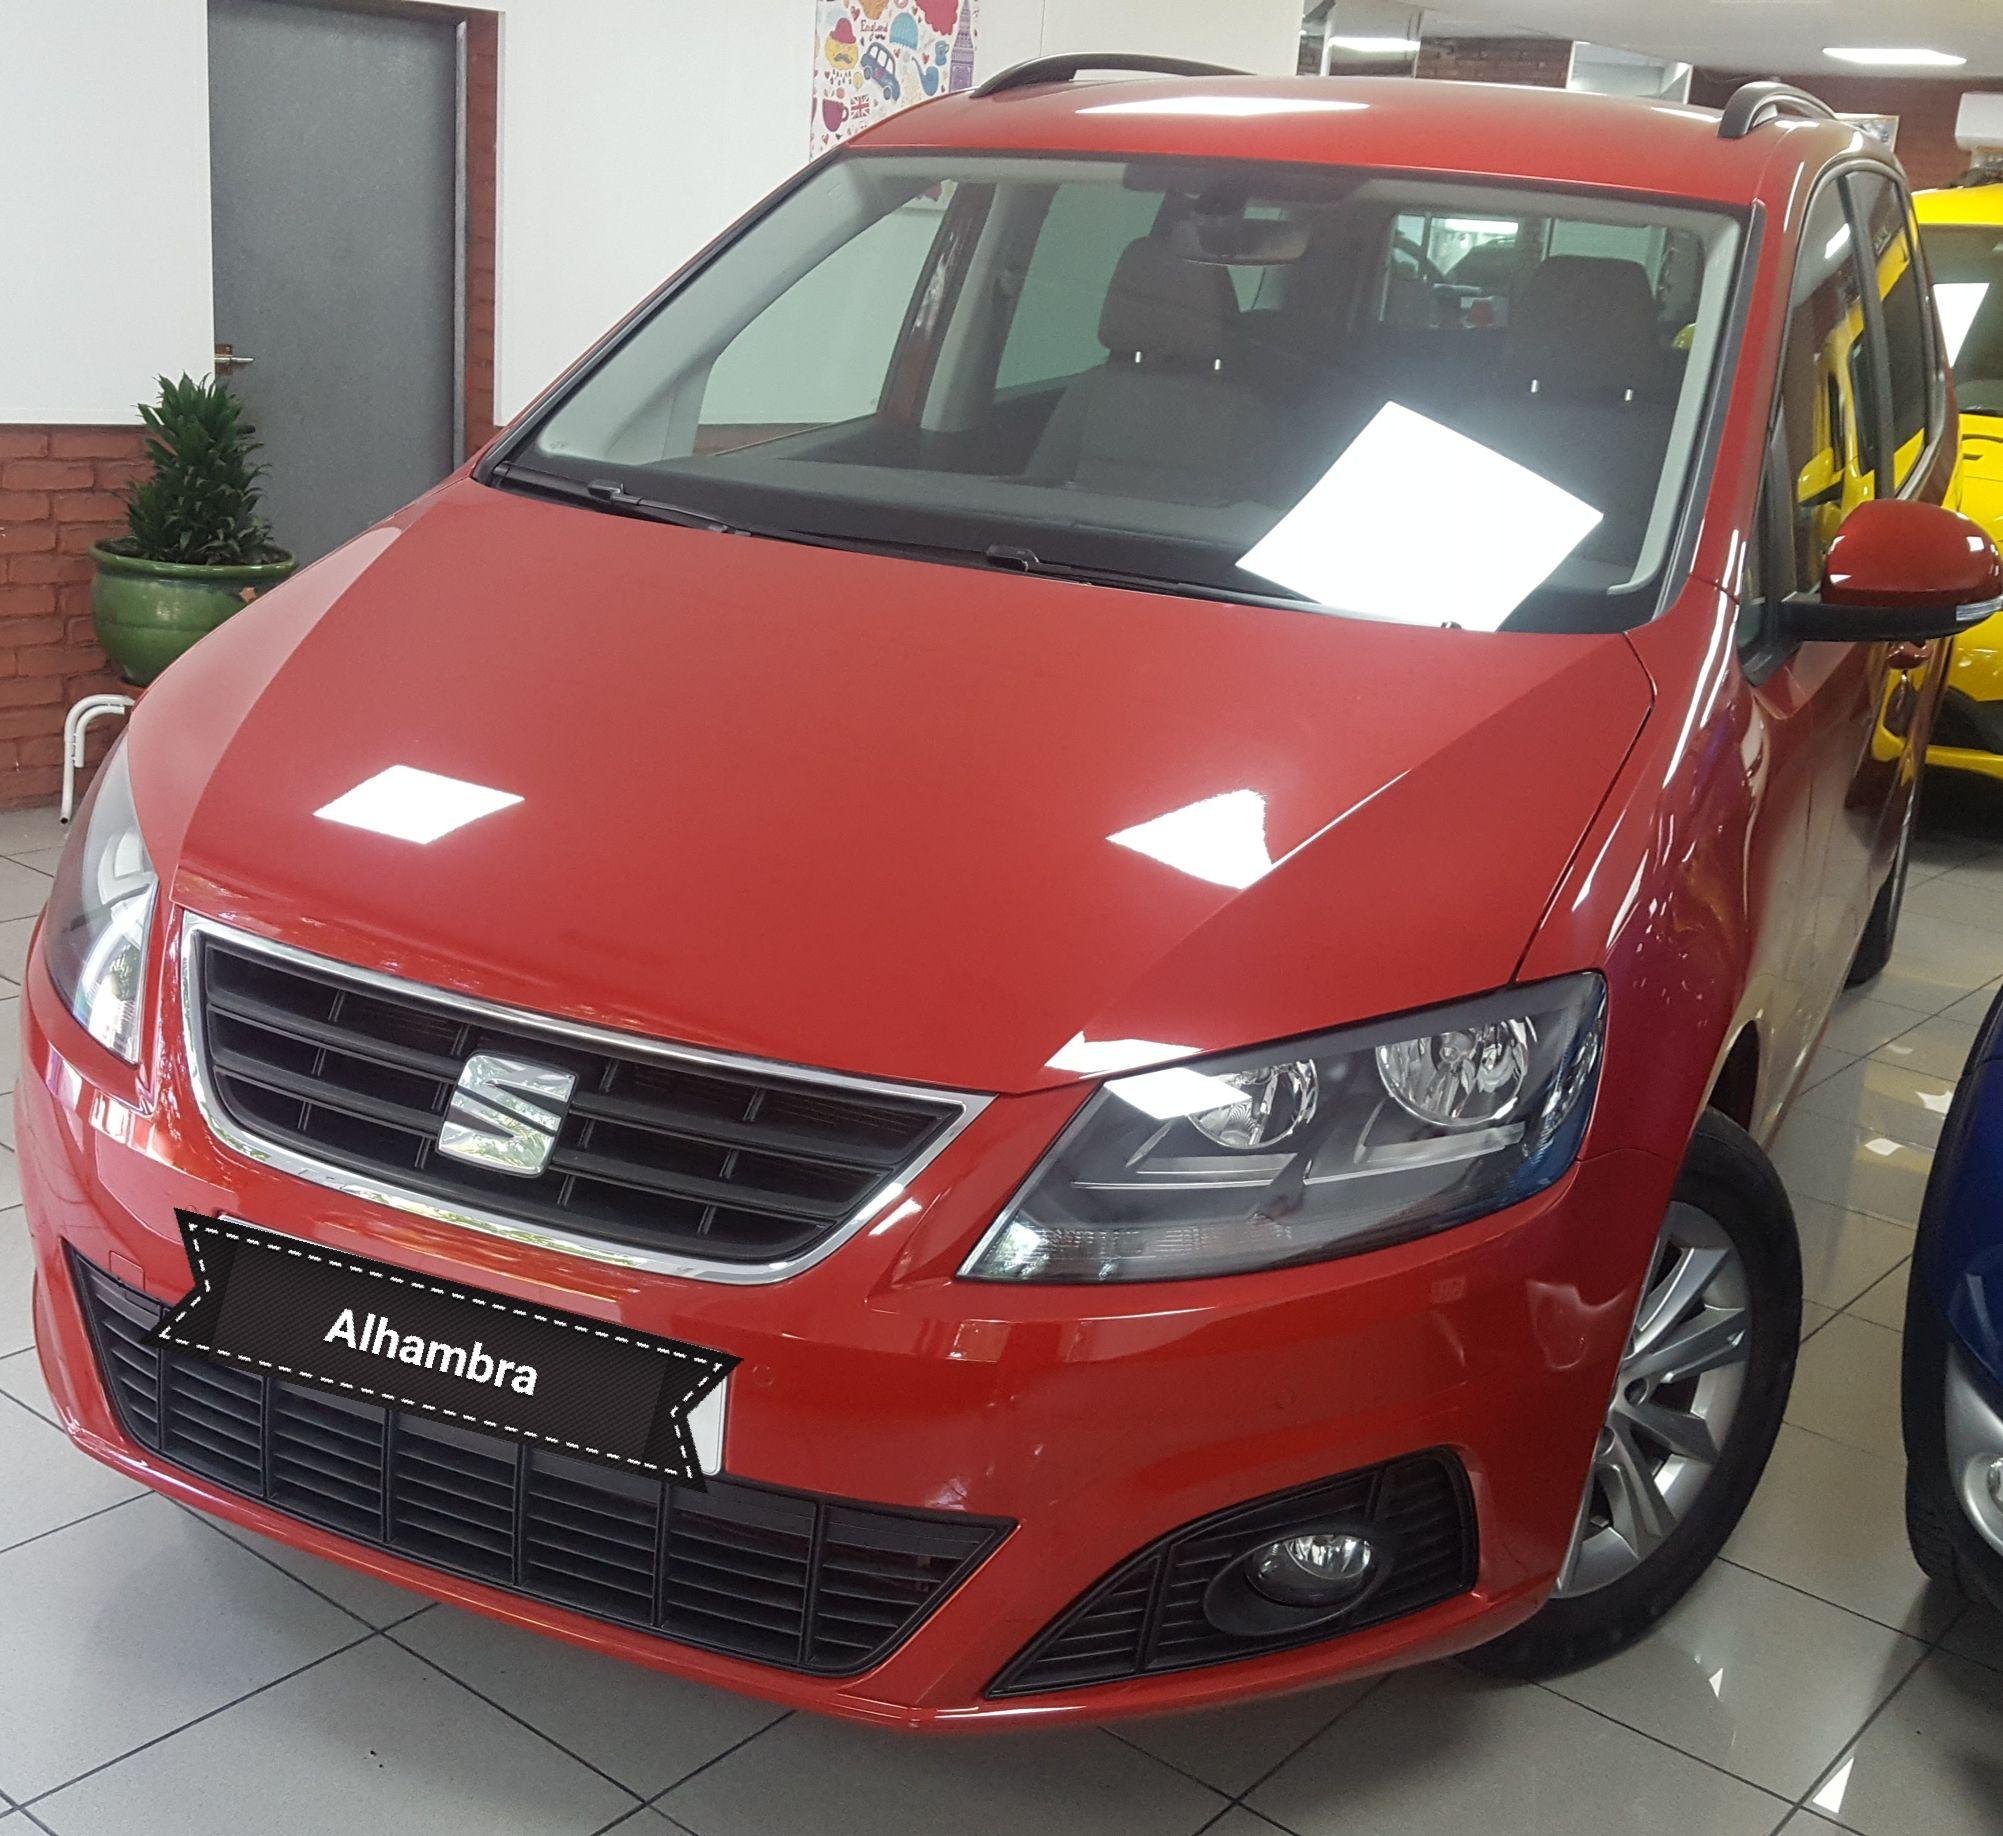 SEAT ALHAMBRA 2.0 TDI REFERENCE ECO 110KW (150CV) : Catálogo de Automòbils Rambla